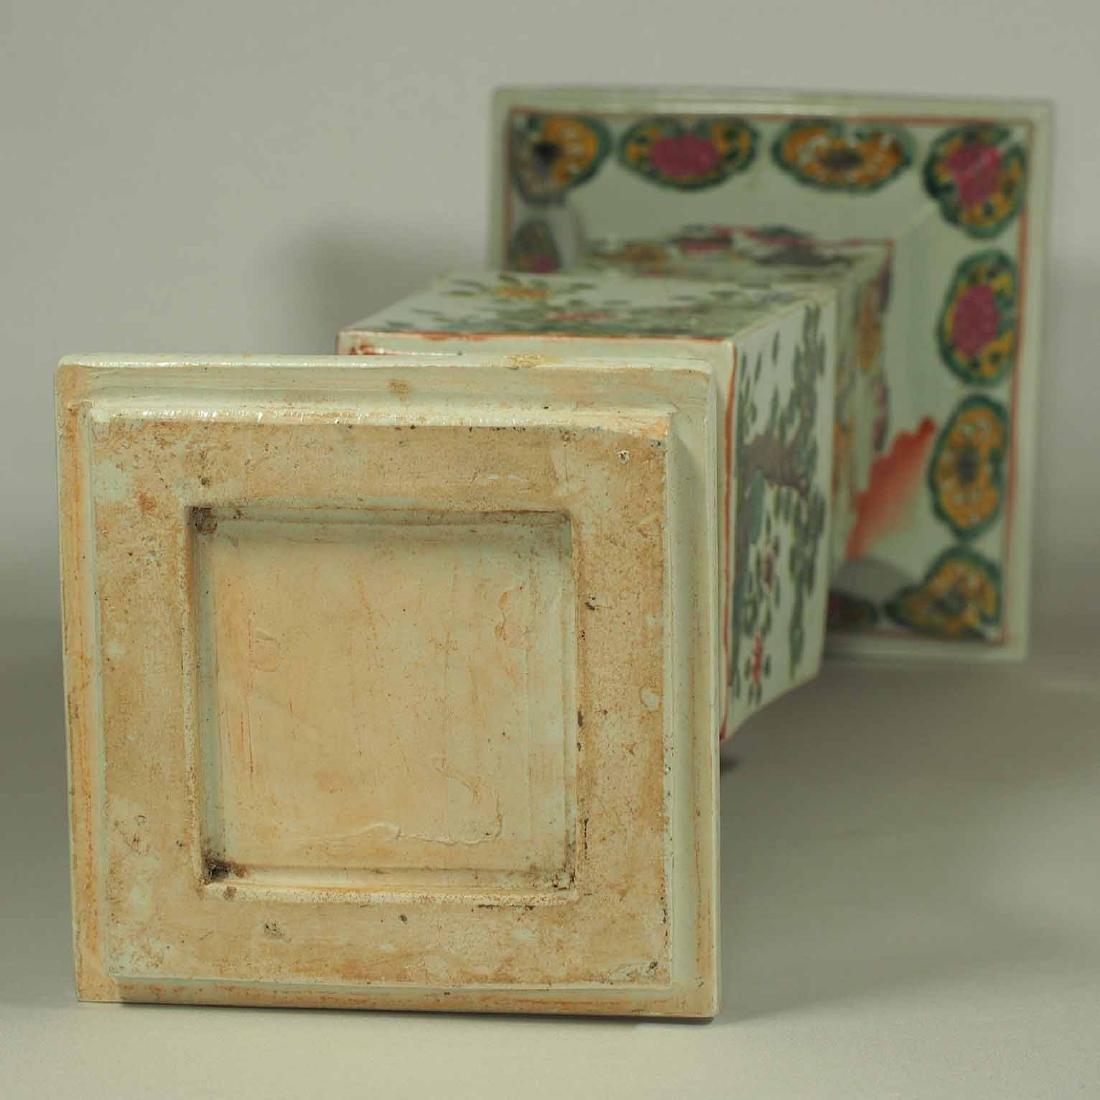 Square Gu-Form Vase, Tongzhi Period, Qing Dynasty - 10